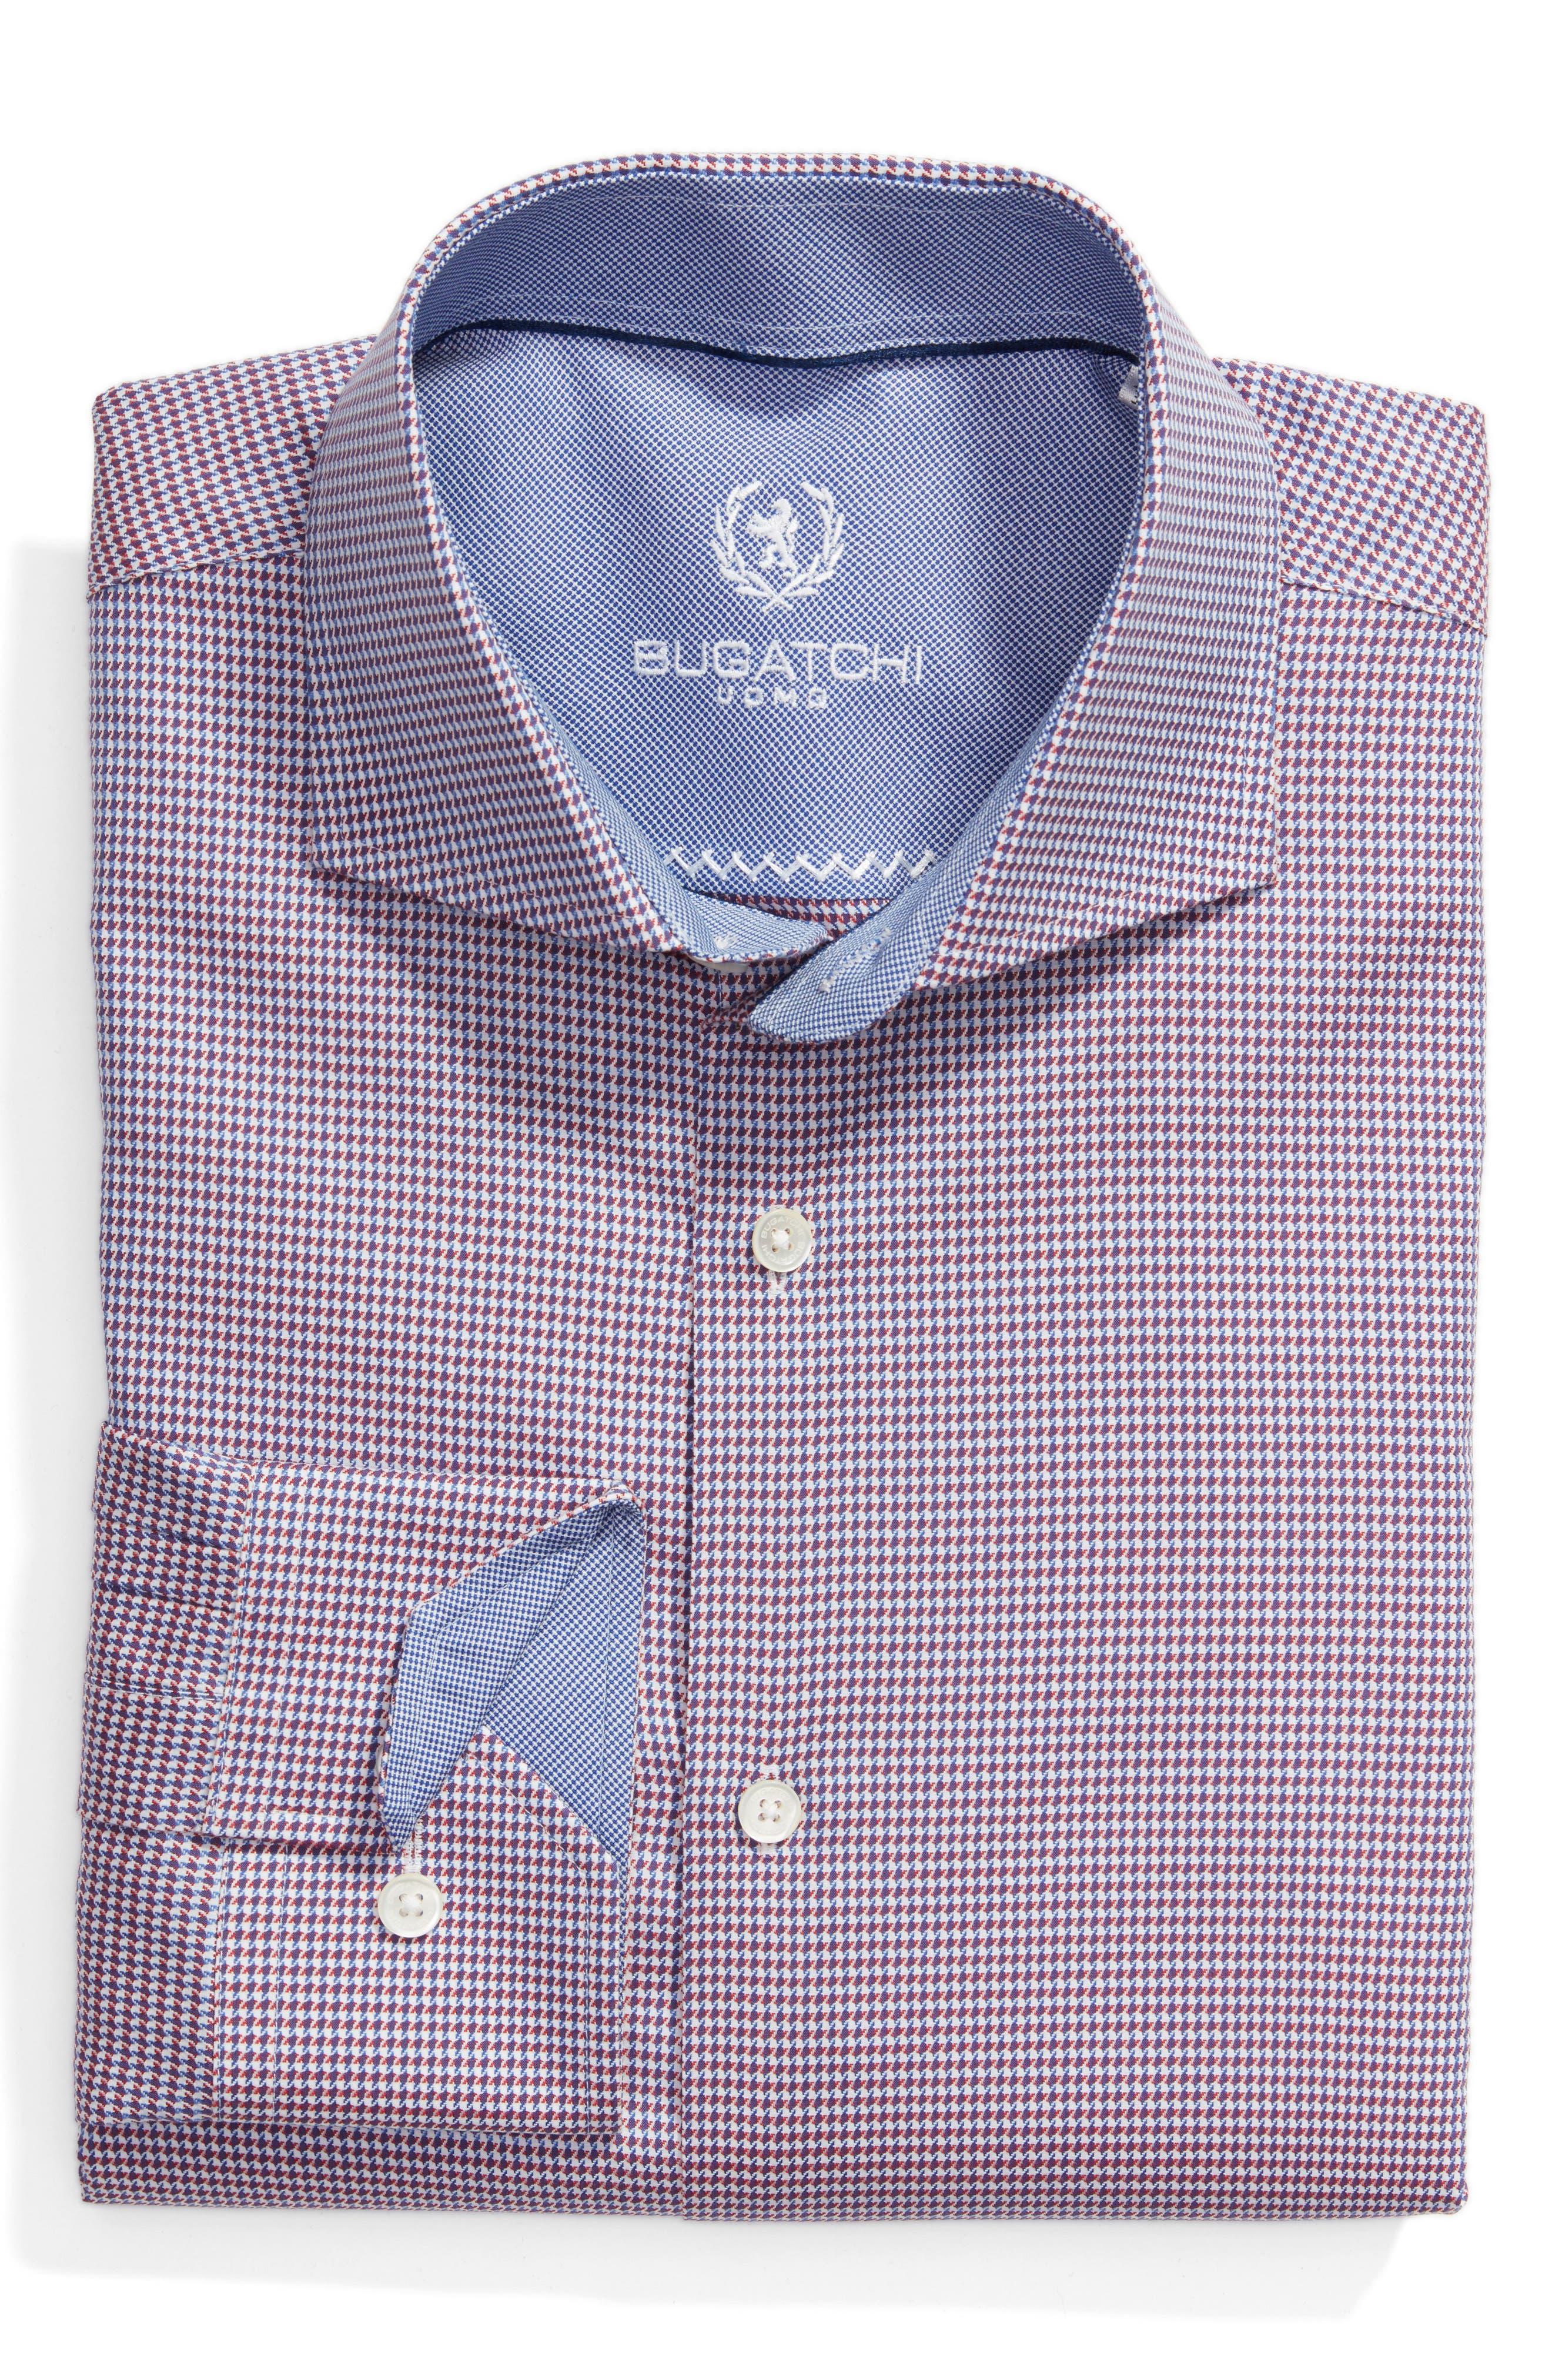 Trim Fit Houndstooth Dress Shirt,                         Main,                         color, 602